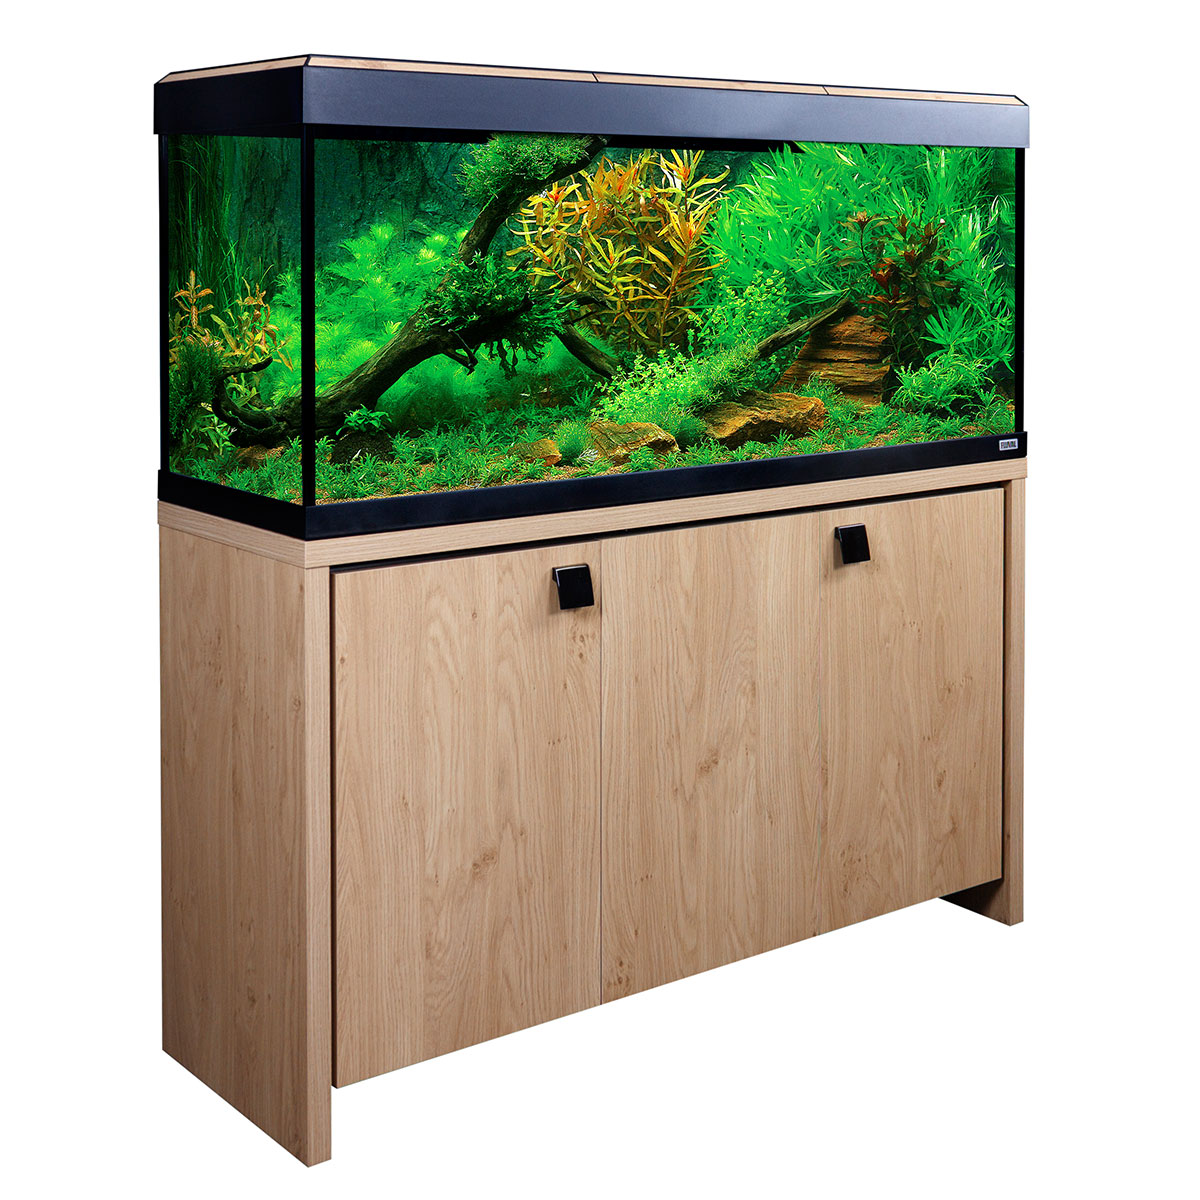 fluval aquarium roma 240 kombination g nstig kaufen bei zooroyal. Black Bedroom Furniture Sets. Home Design Ideas